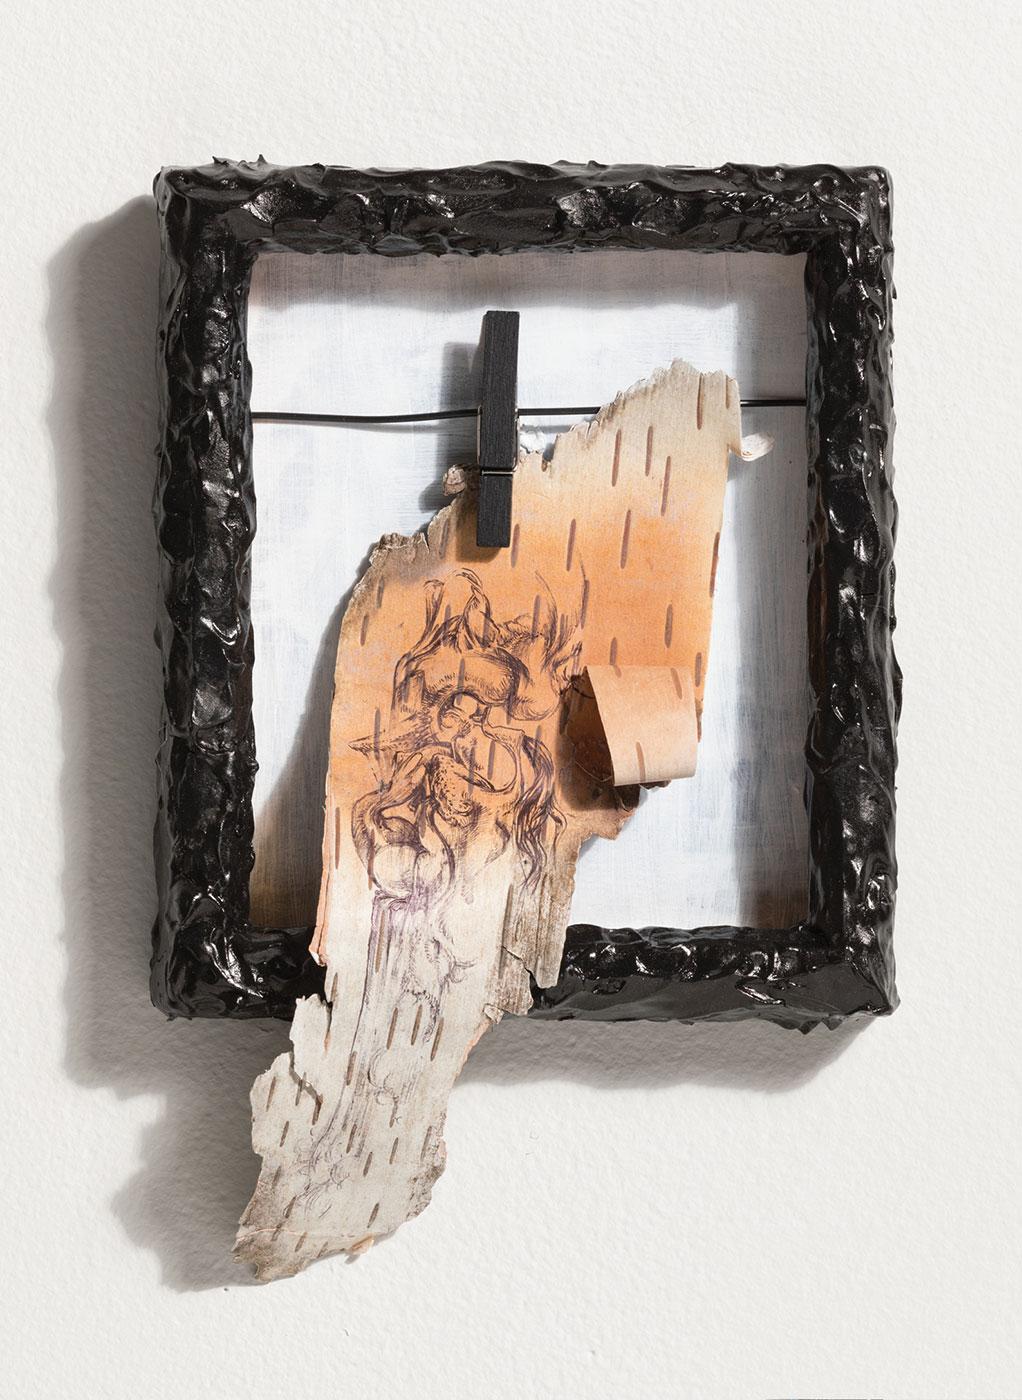 Samantha J. Meyers - Peeling of Things